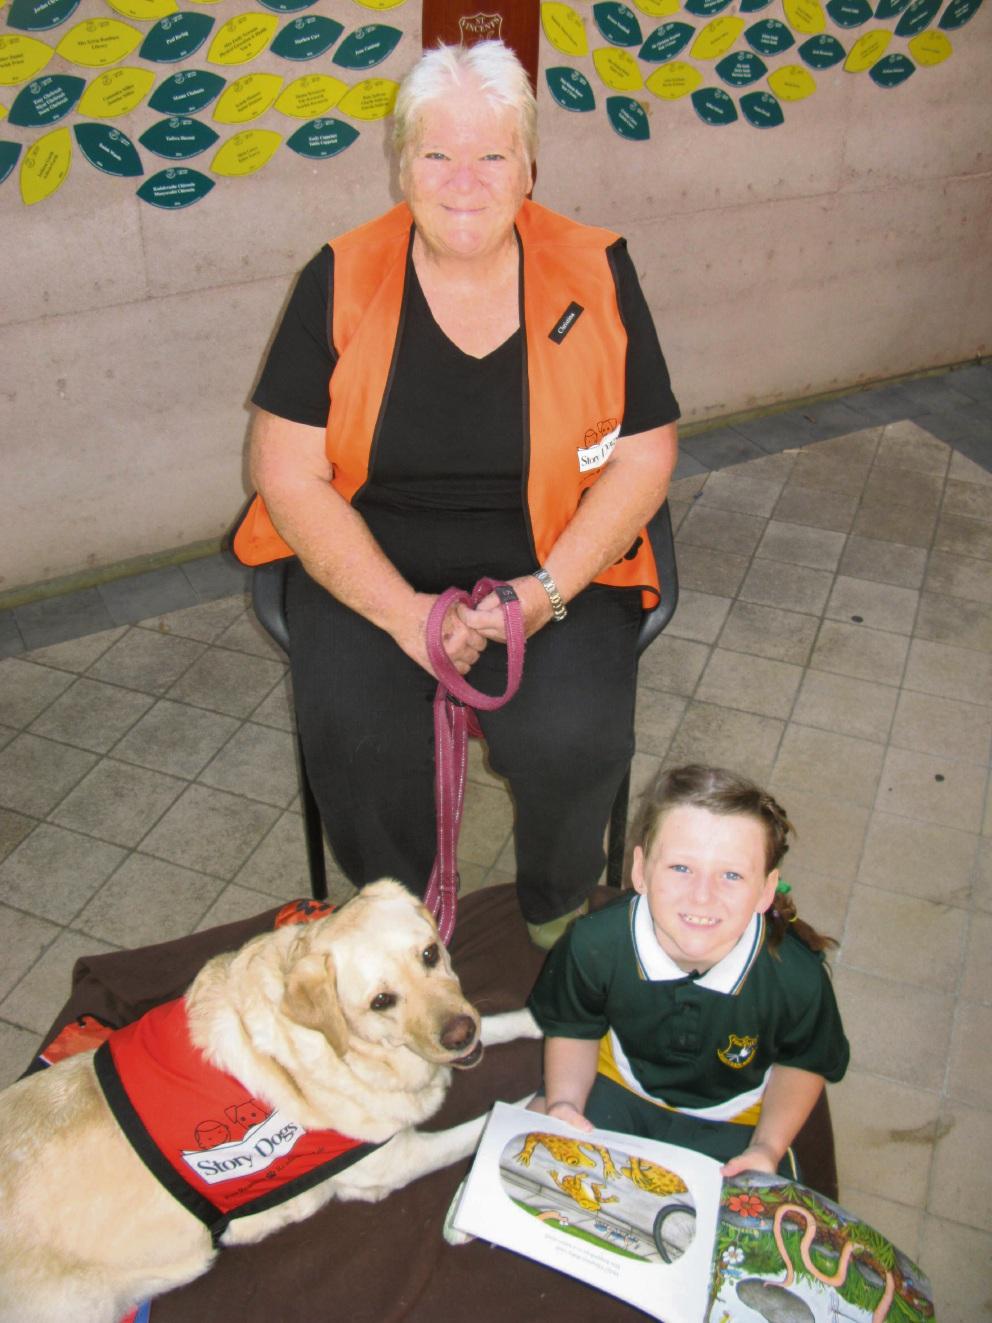 Volunteer Christina Macaulay with St Vincent's Catholic Primary School student Taylor Javanovic and labrador Jasmine.